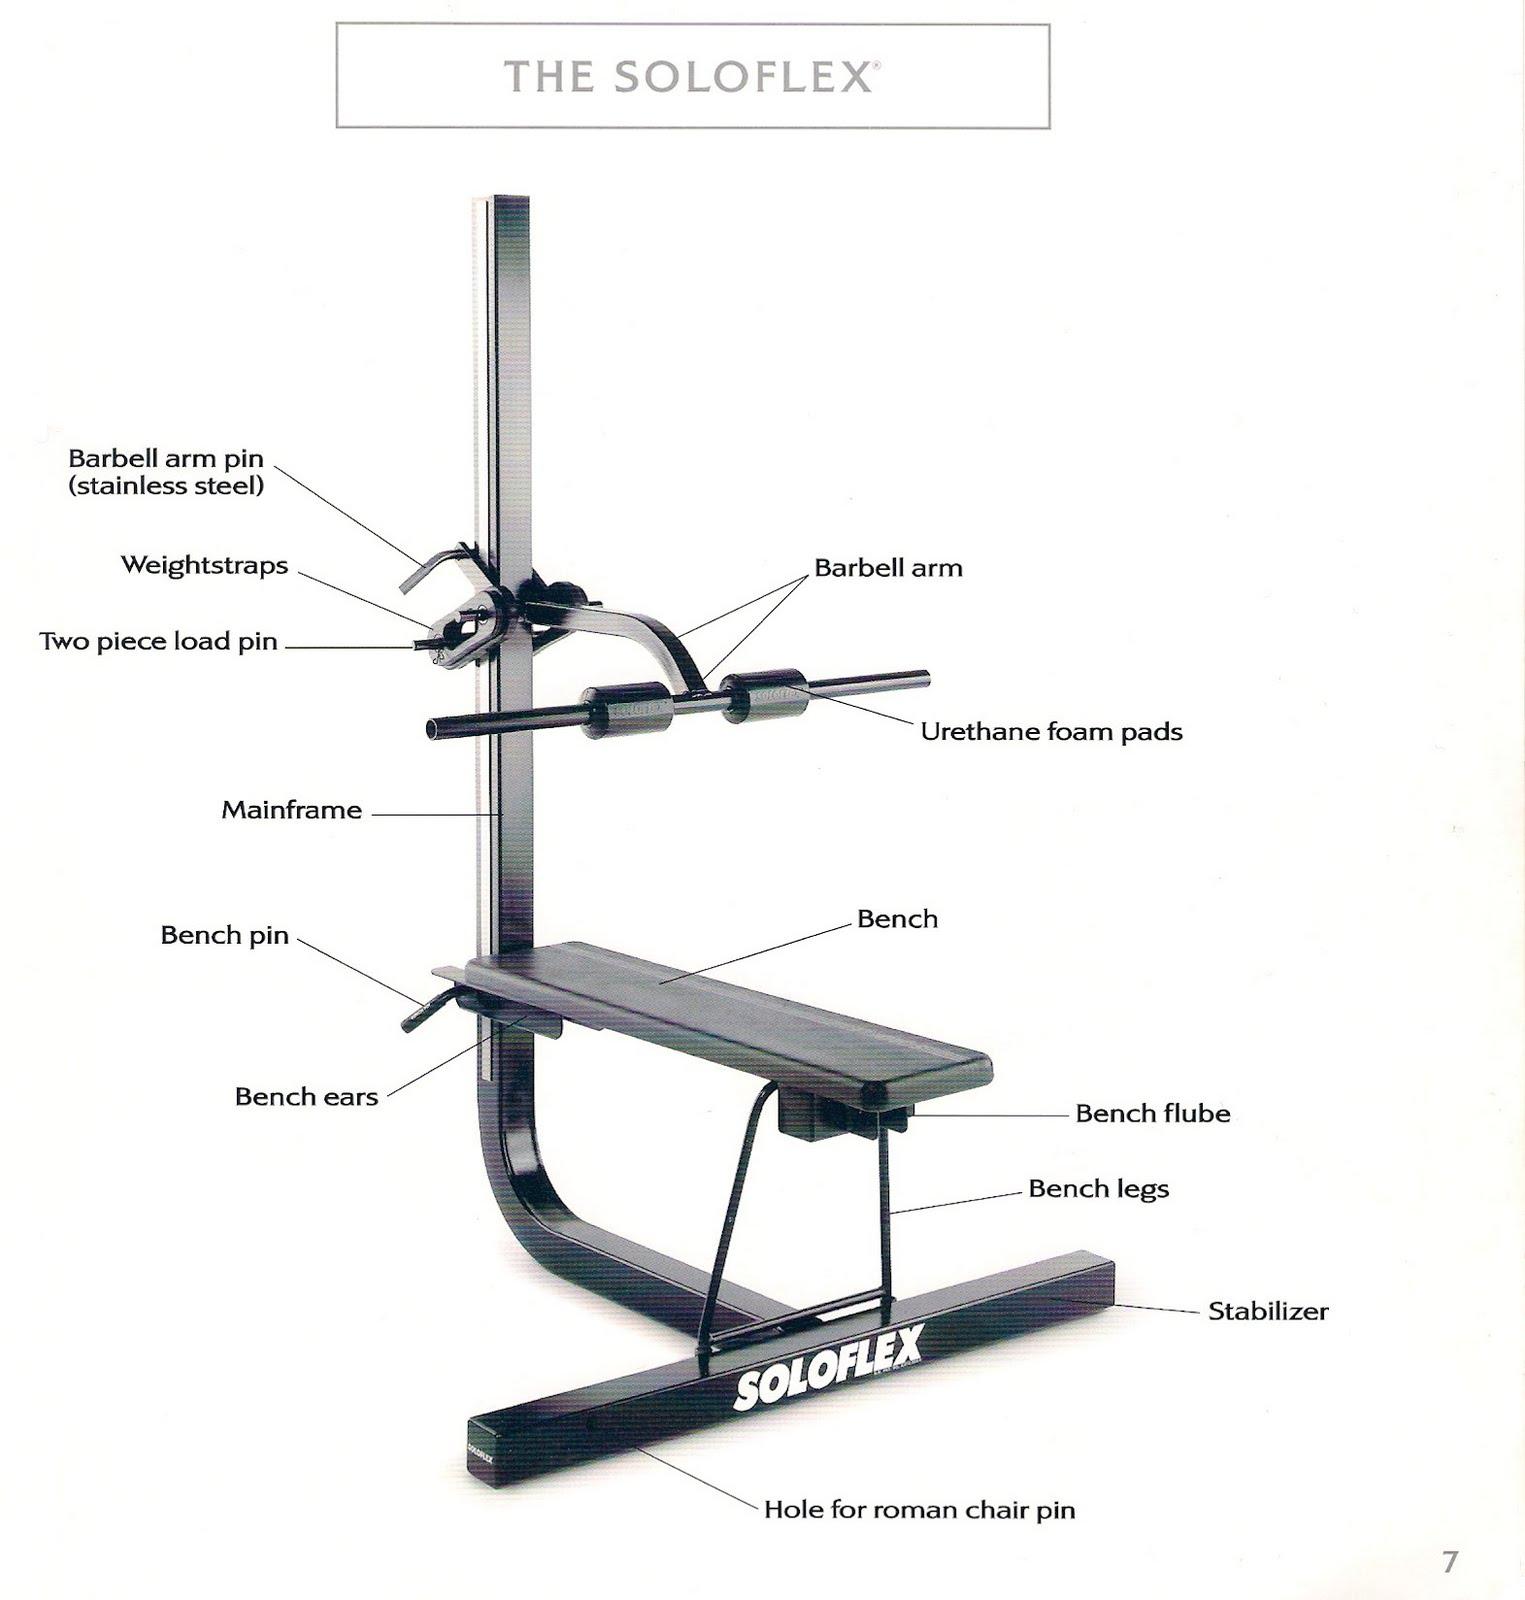 soloflex machine